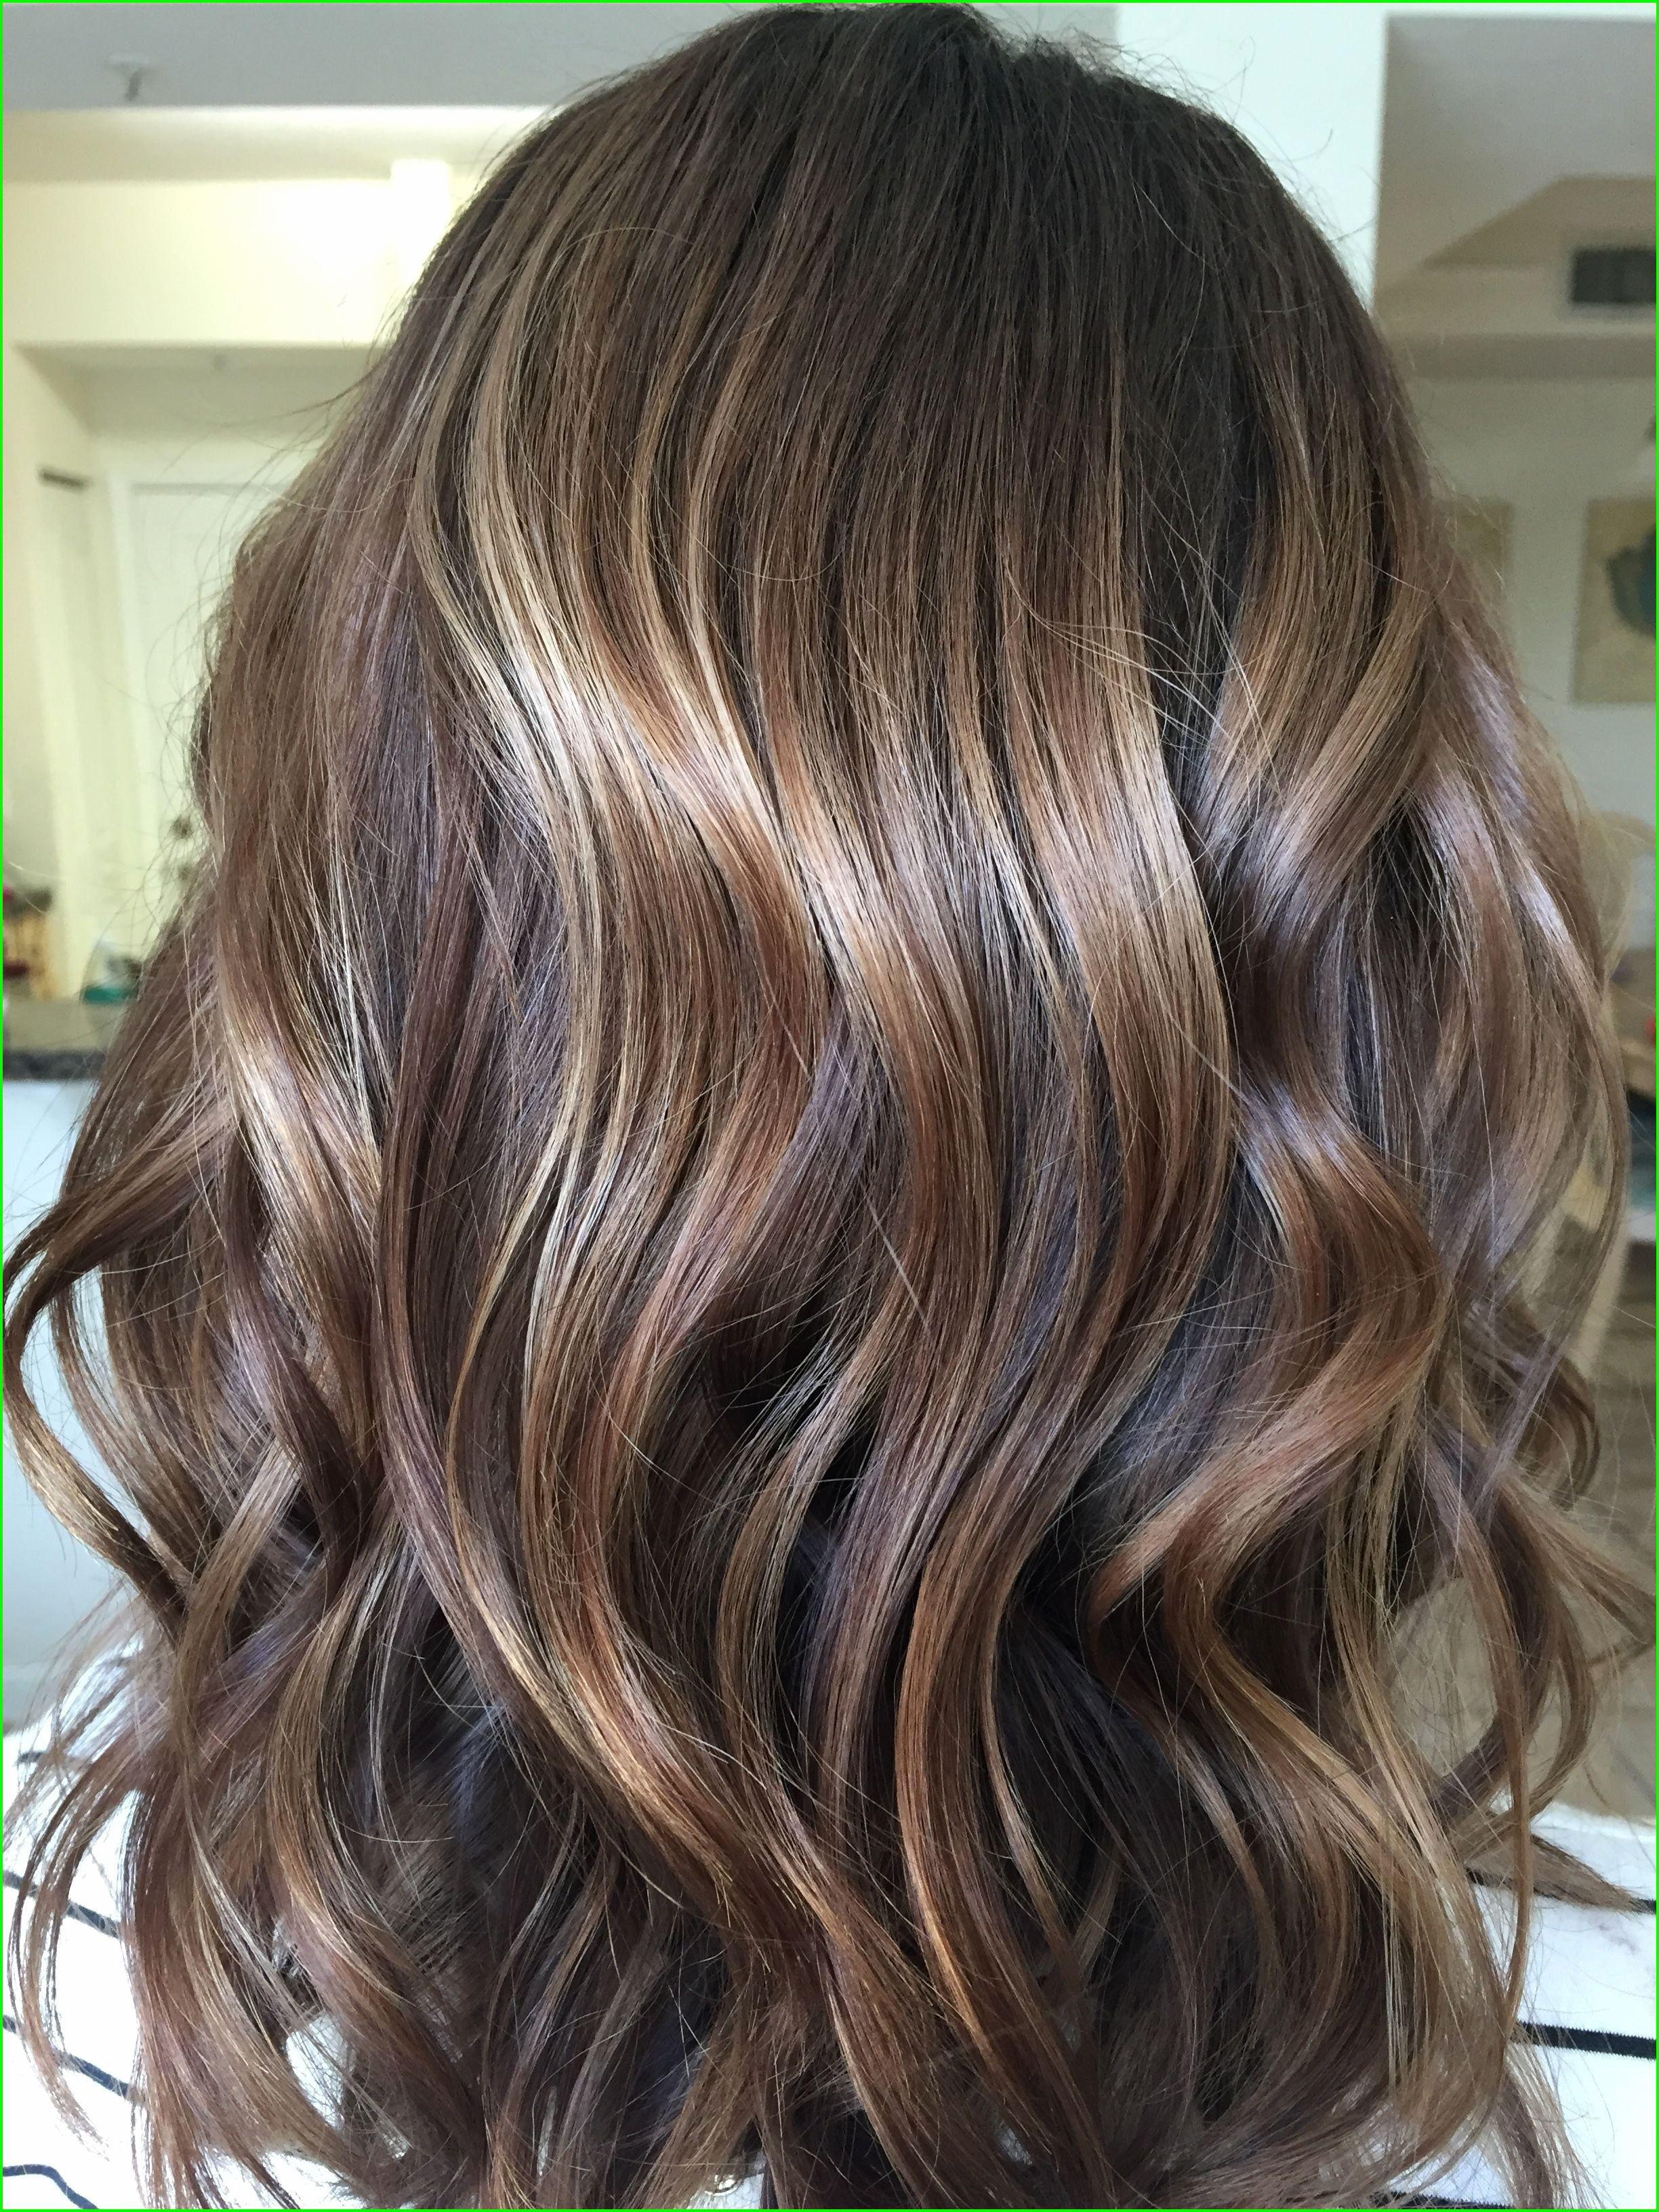 Olive Green Hair Color 7539 Hairstyles Burgundy Hair Color Chart Striking Redken Hair Dye Matrix Hair Color Redken Hair Color Hair Color Pictures